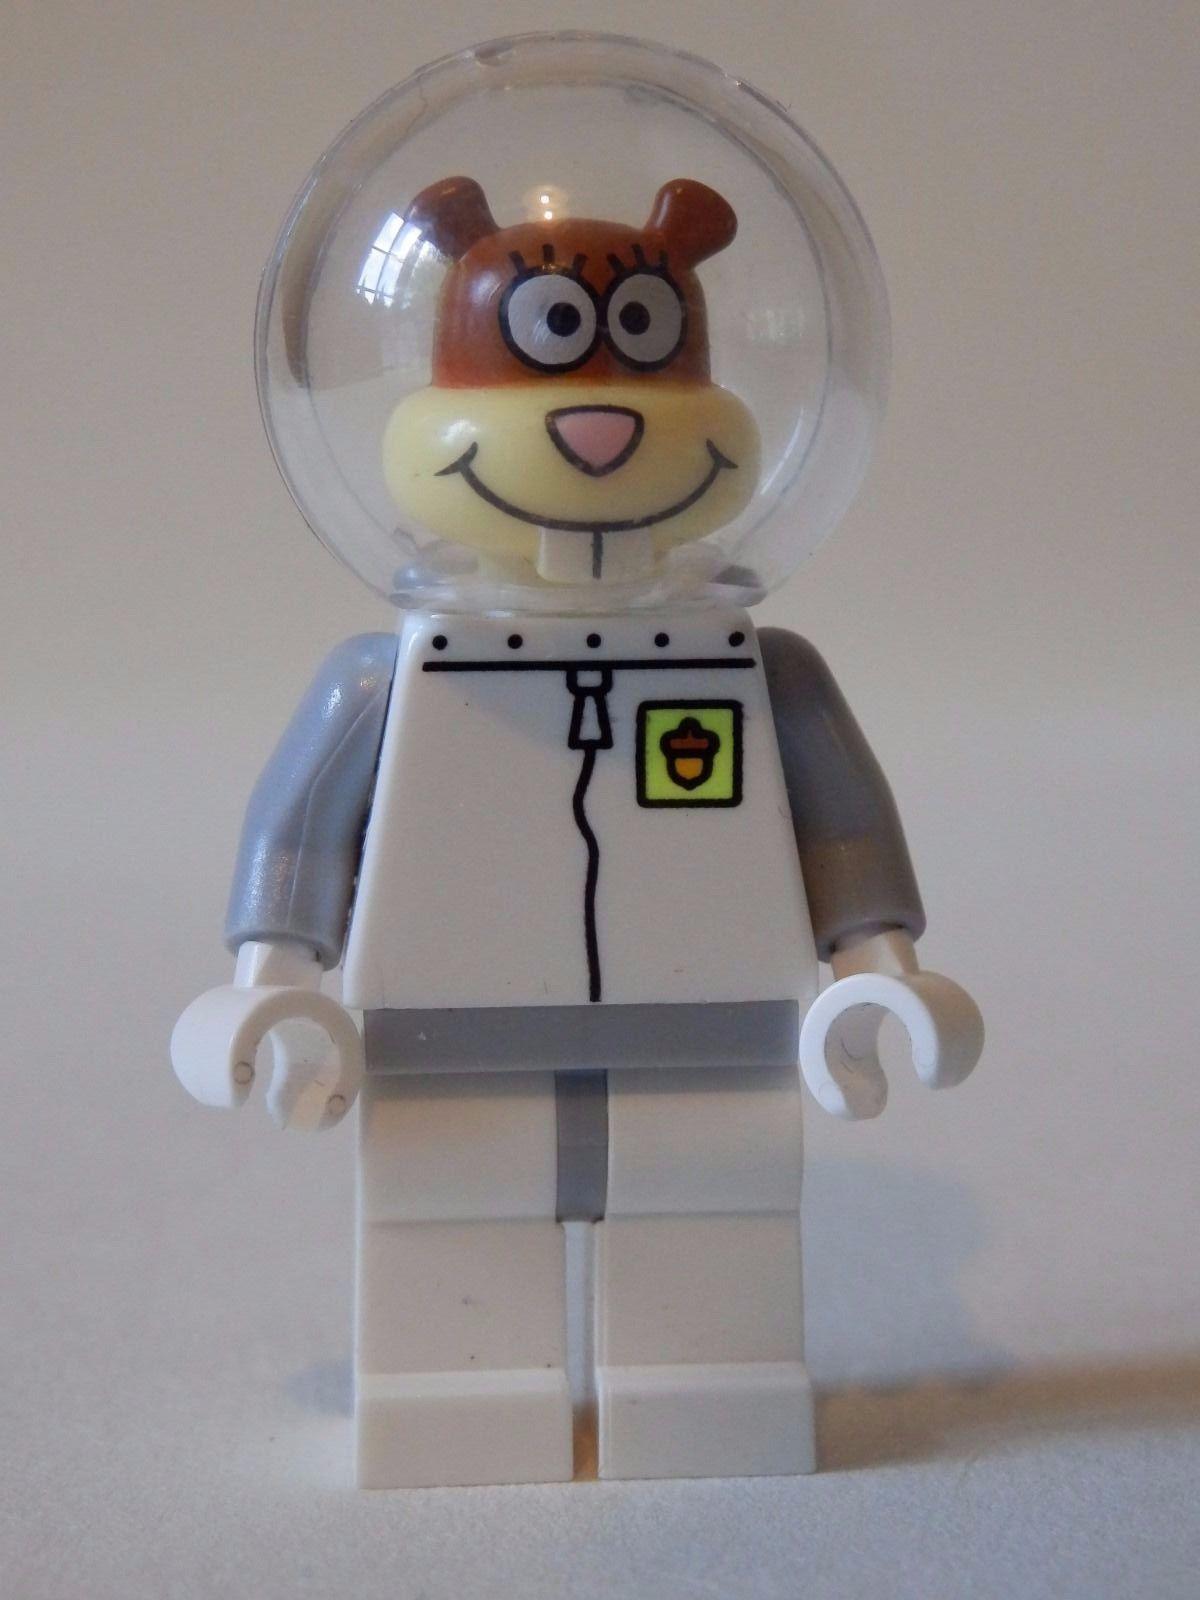 lego spongebob squarepants hamster minifigure space costume